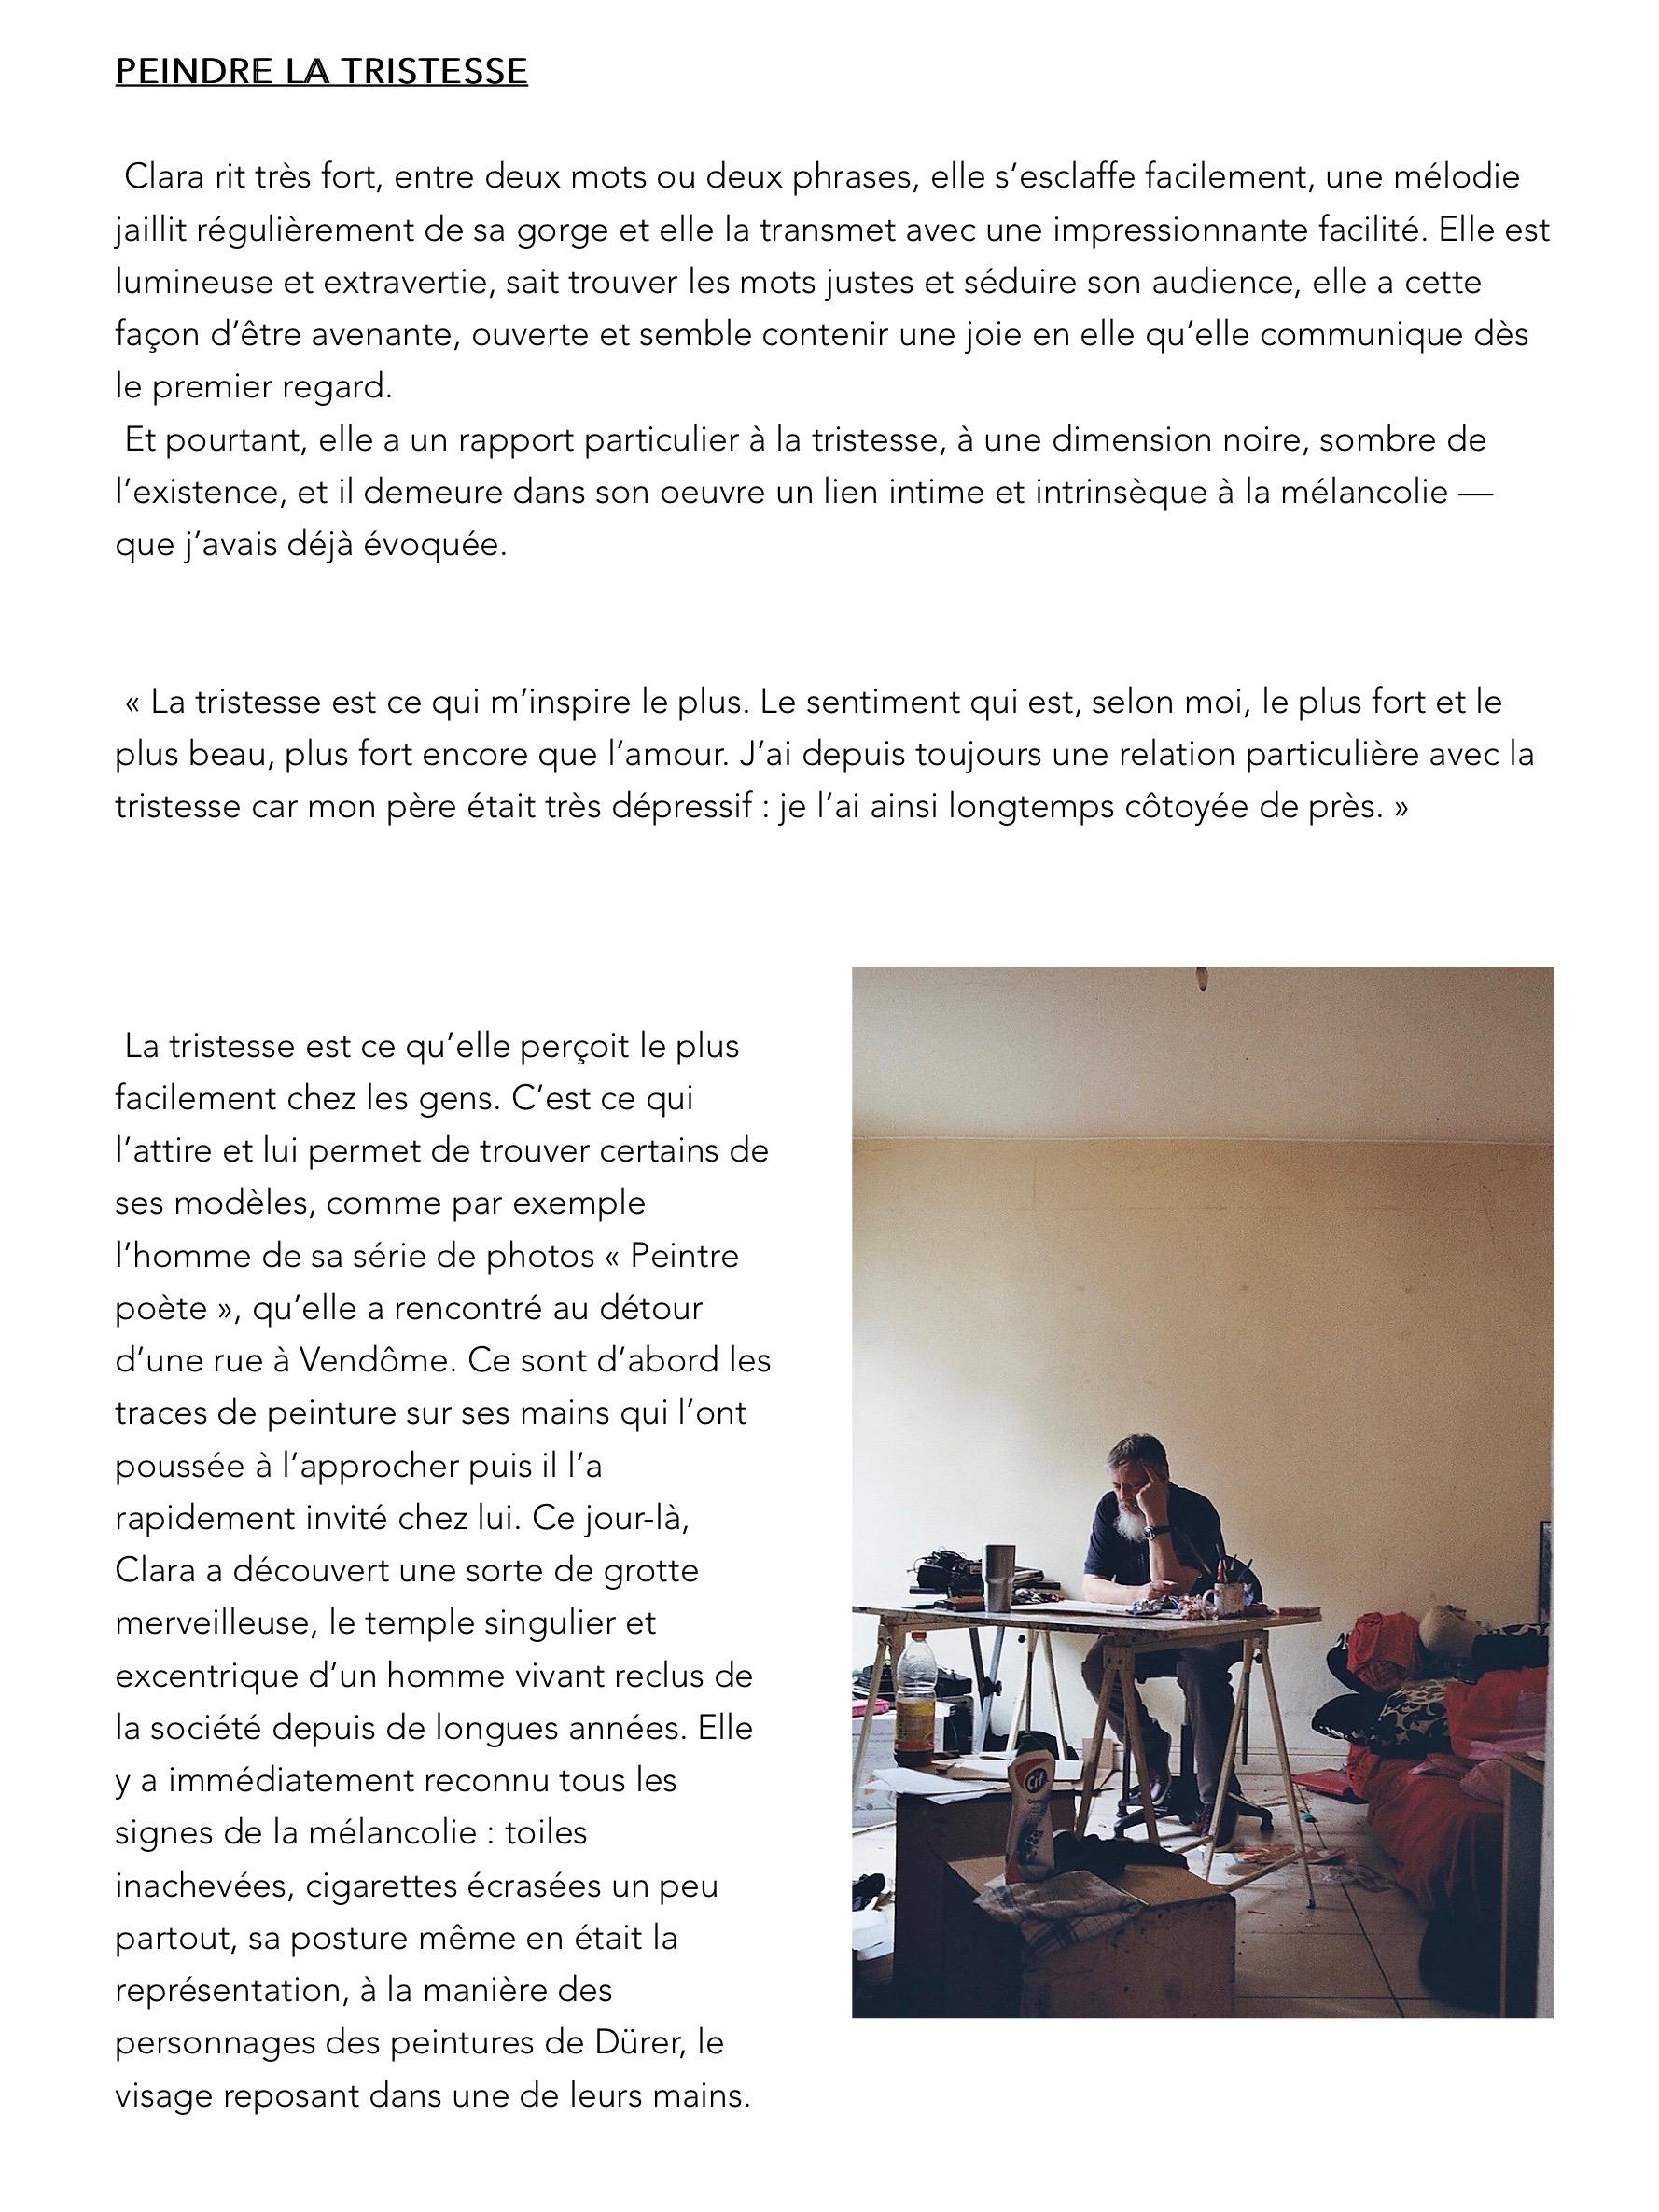 CLARA KENNEDY, POÈTE DU SOUVENIR copie